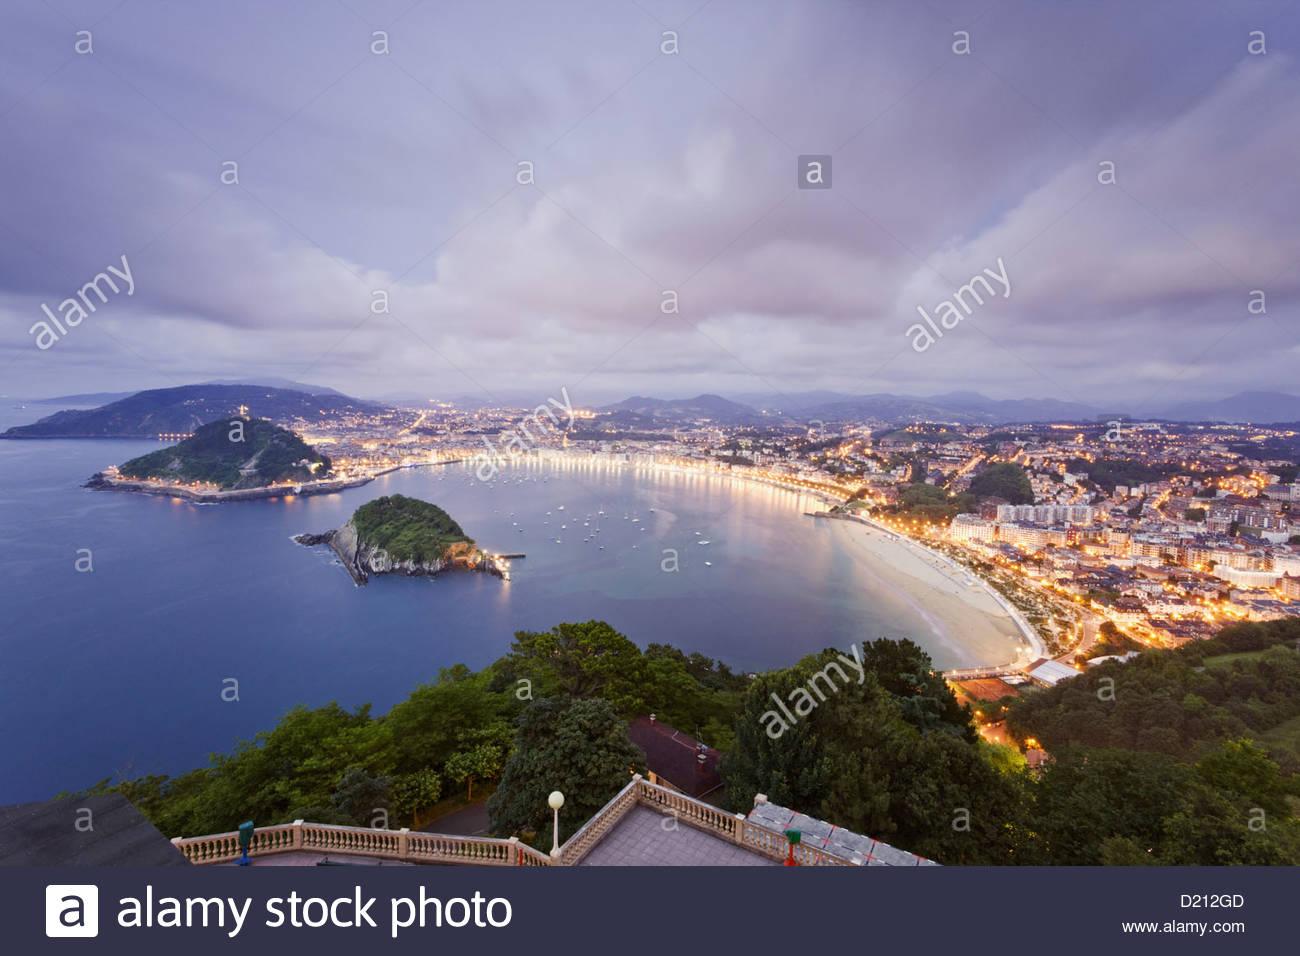 View from the Monte Igueldo onto the San Sebastian bay, La Concha, Donostia, San Sebastian, Basque Country, Spain - Stock Image